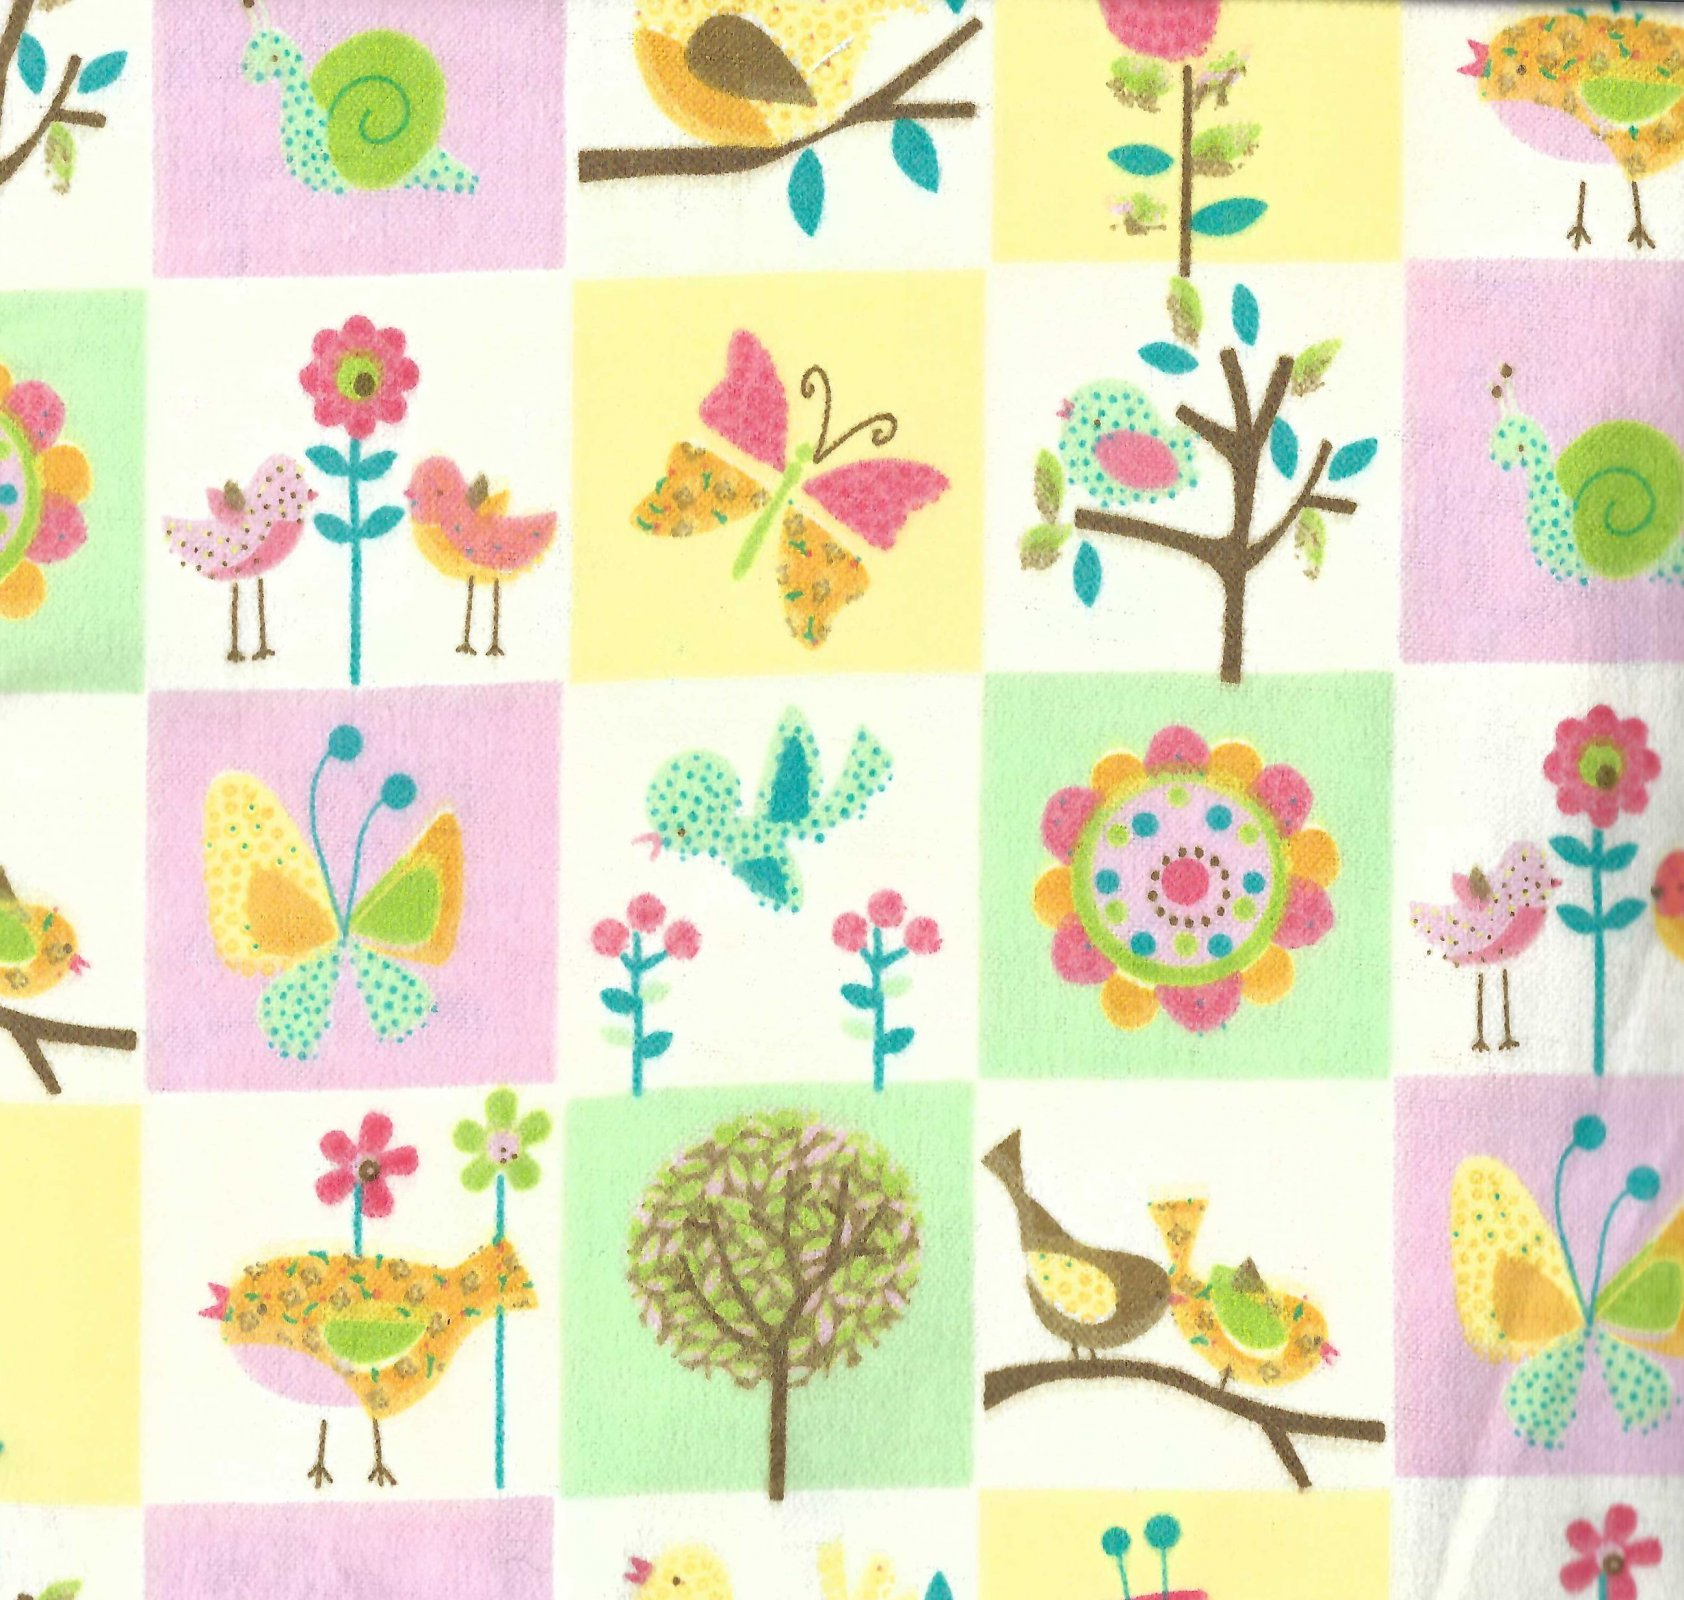 Flannel Hemstitched - Spring has Sprung